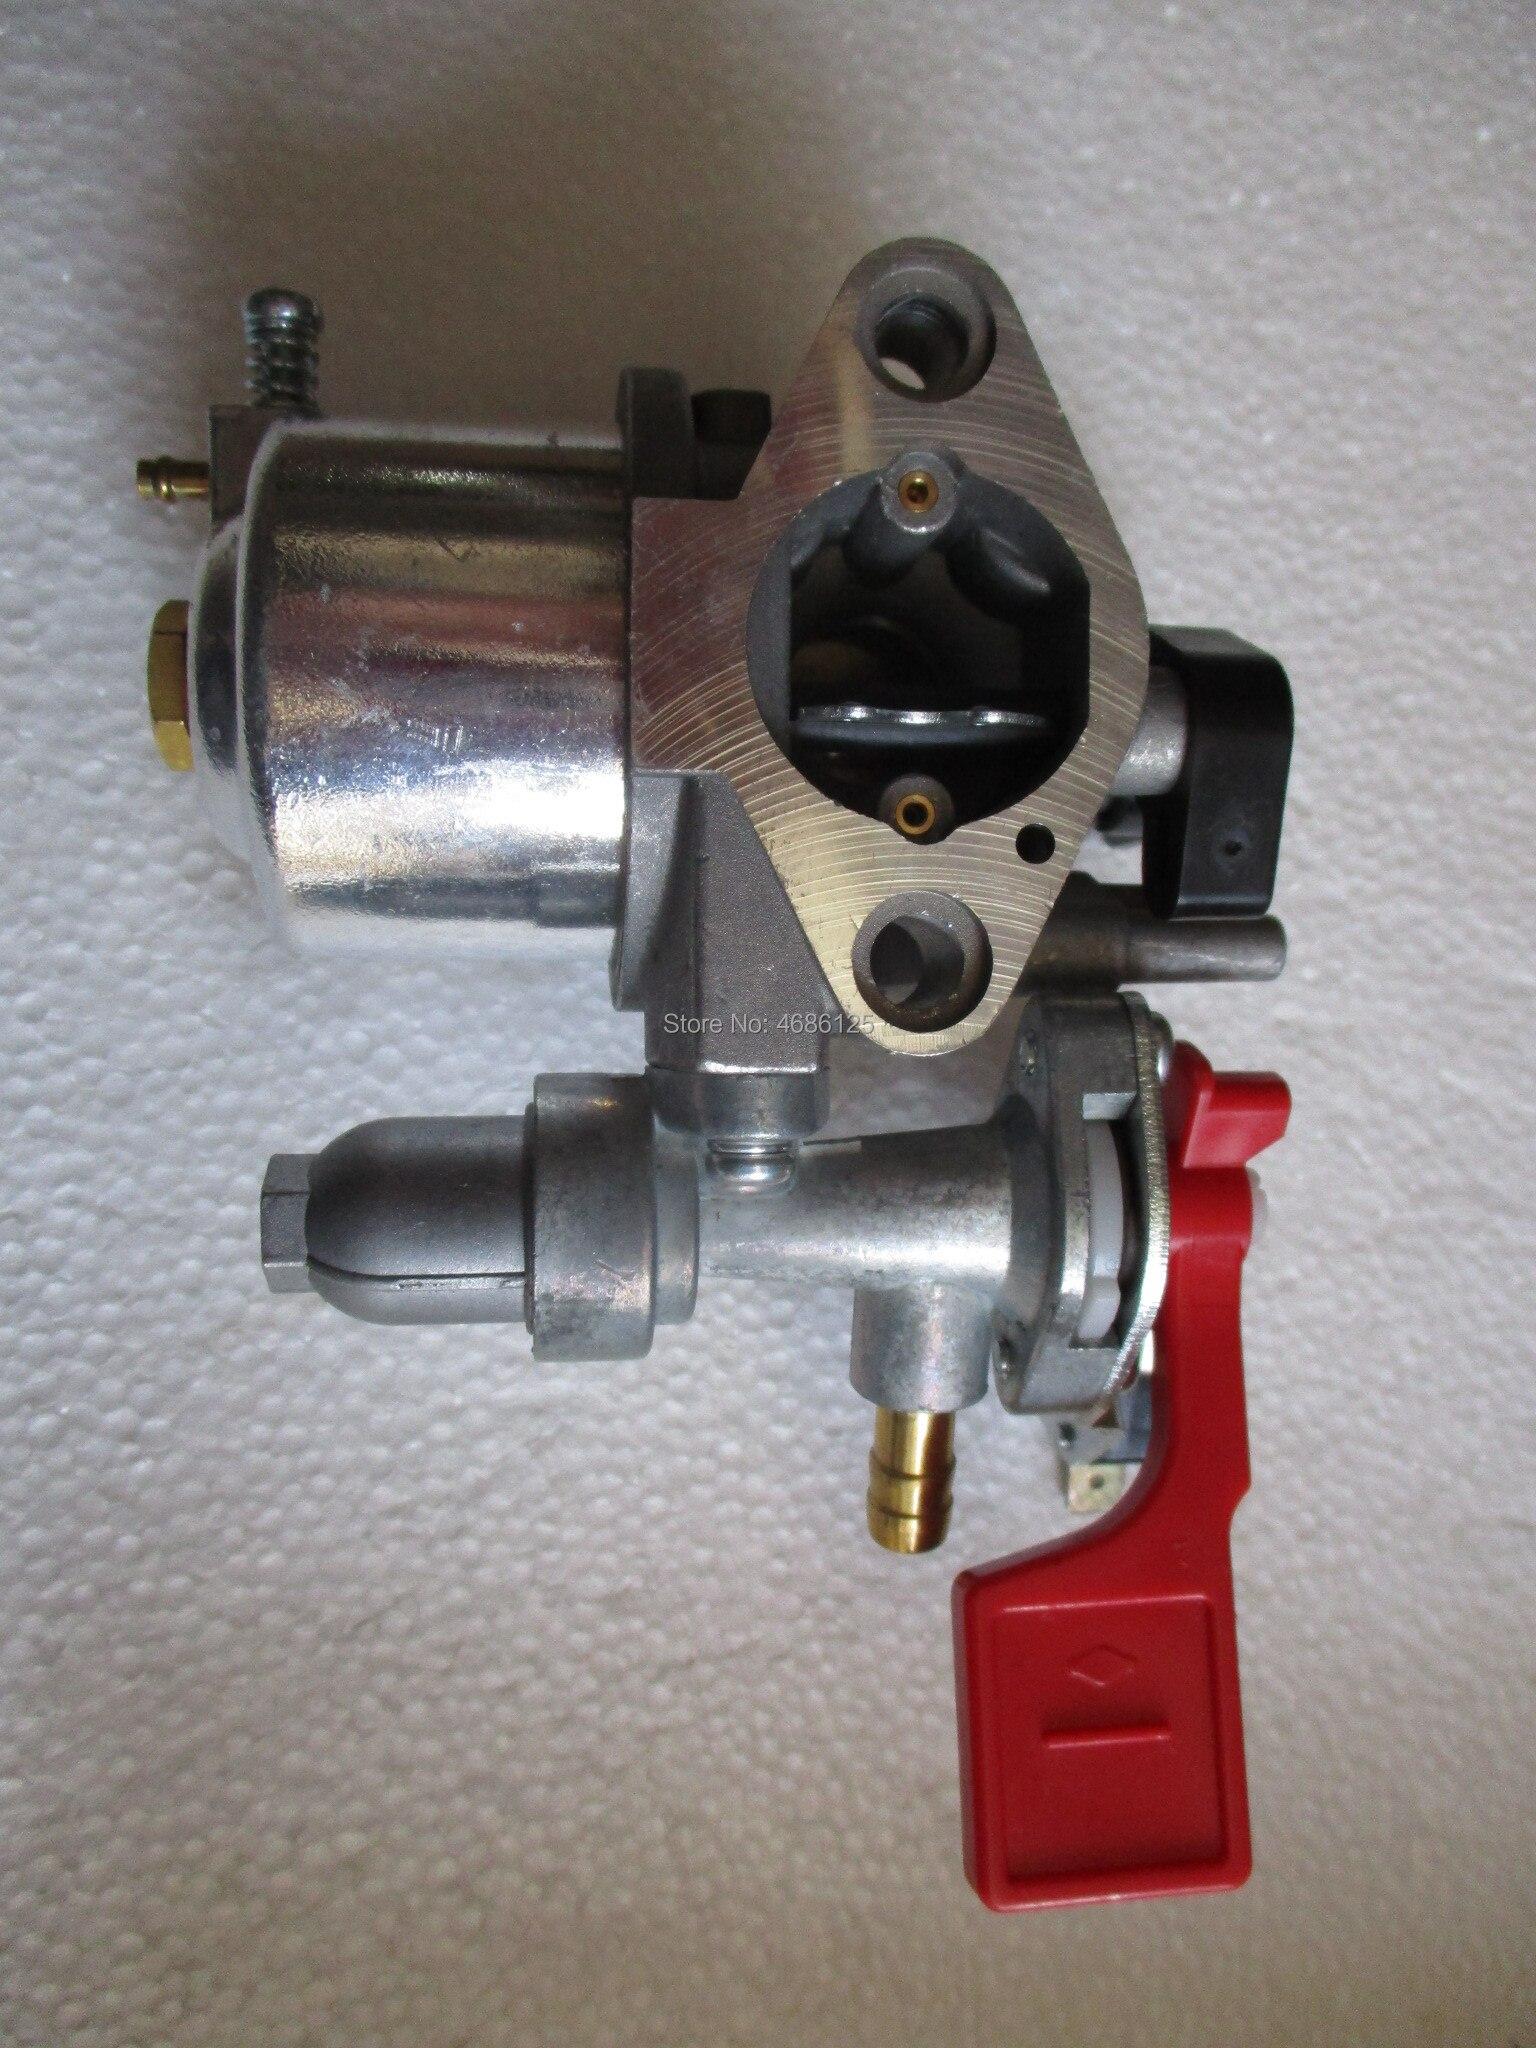 13H332 6 5HP CARBURETOR Briggs and stratton CARBURETOR gasoline engine parts